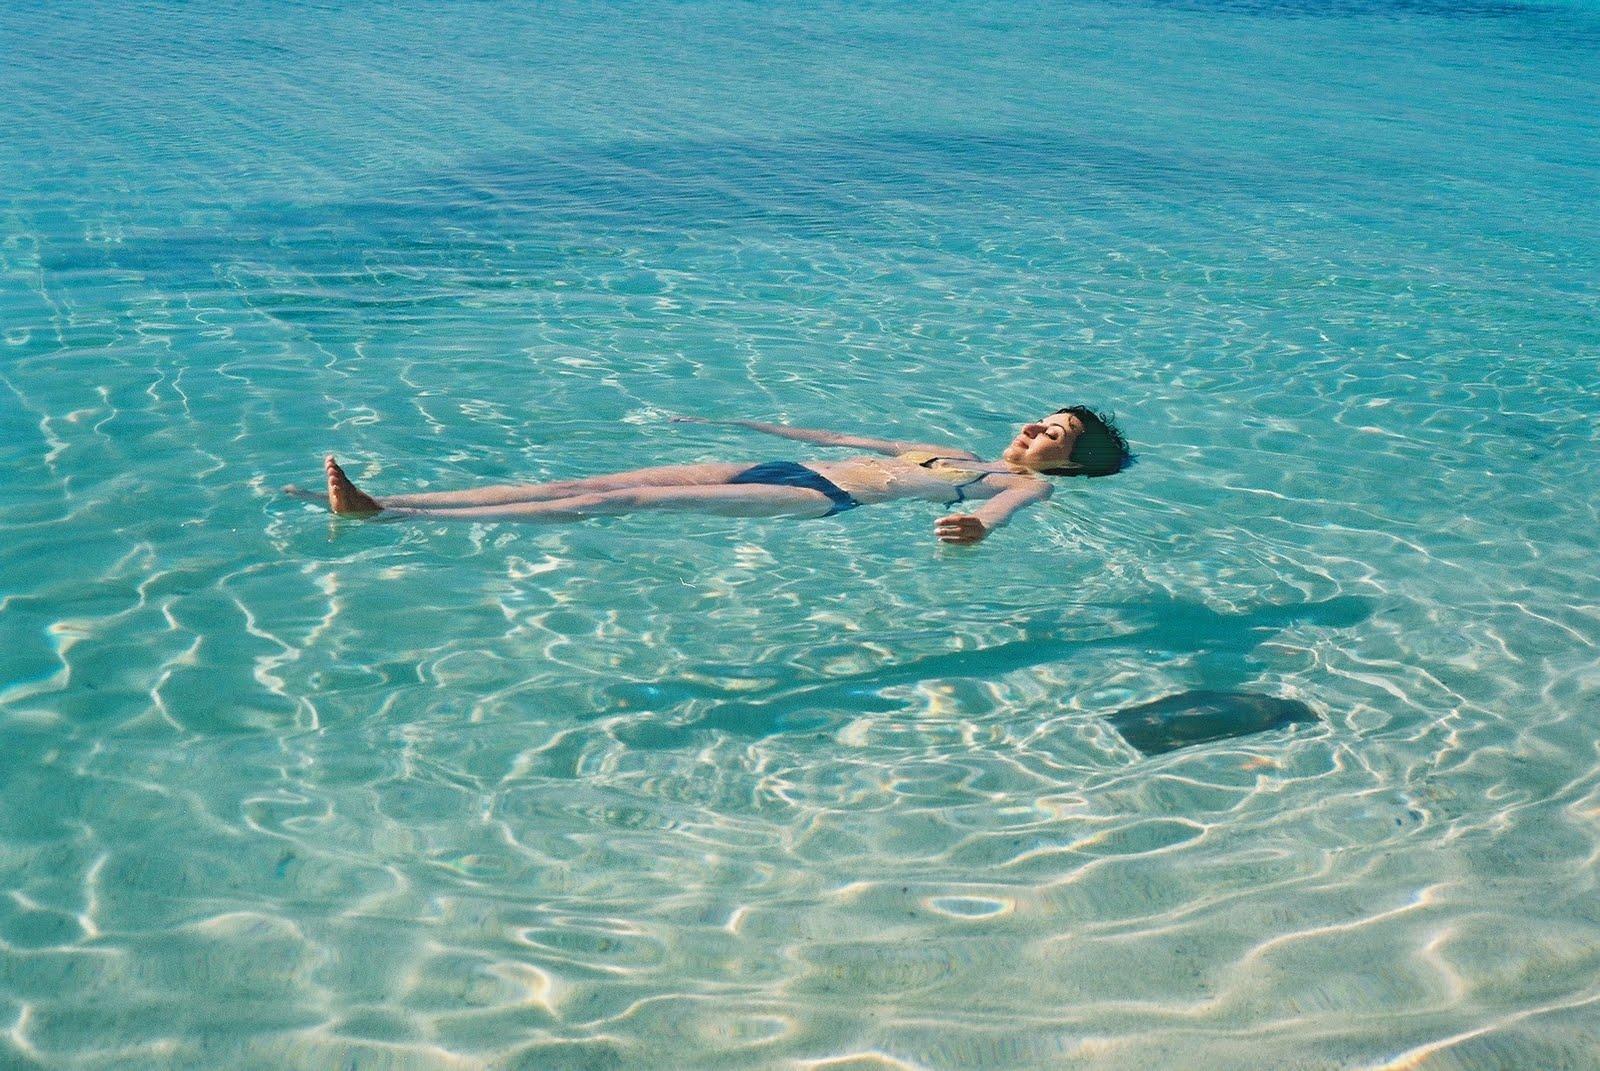 http://3.bp.blogspot.com/_WyL9H8sI-gc/S9jIWsUGewI/AAAAAAAAAFU/c-U0vcER51o/s1600/Cuba.jpg